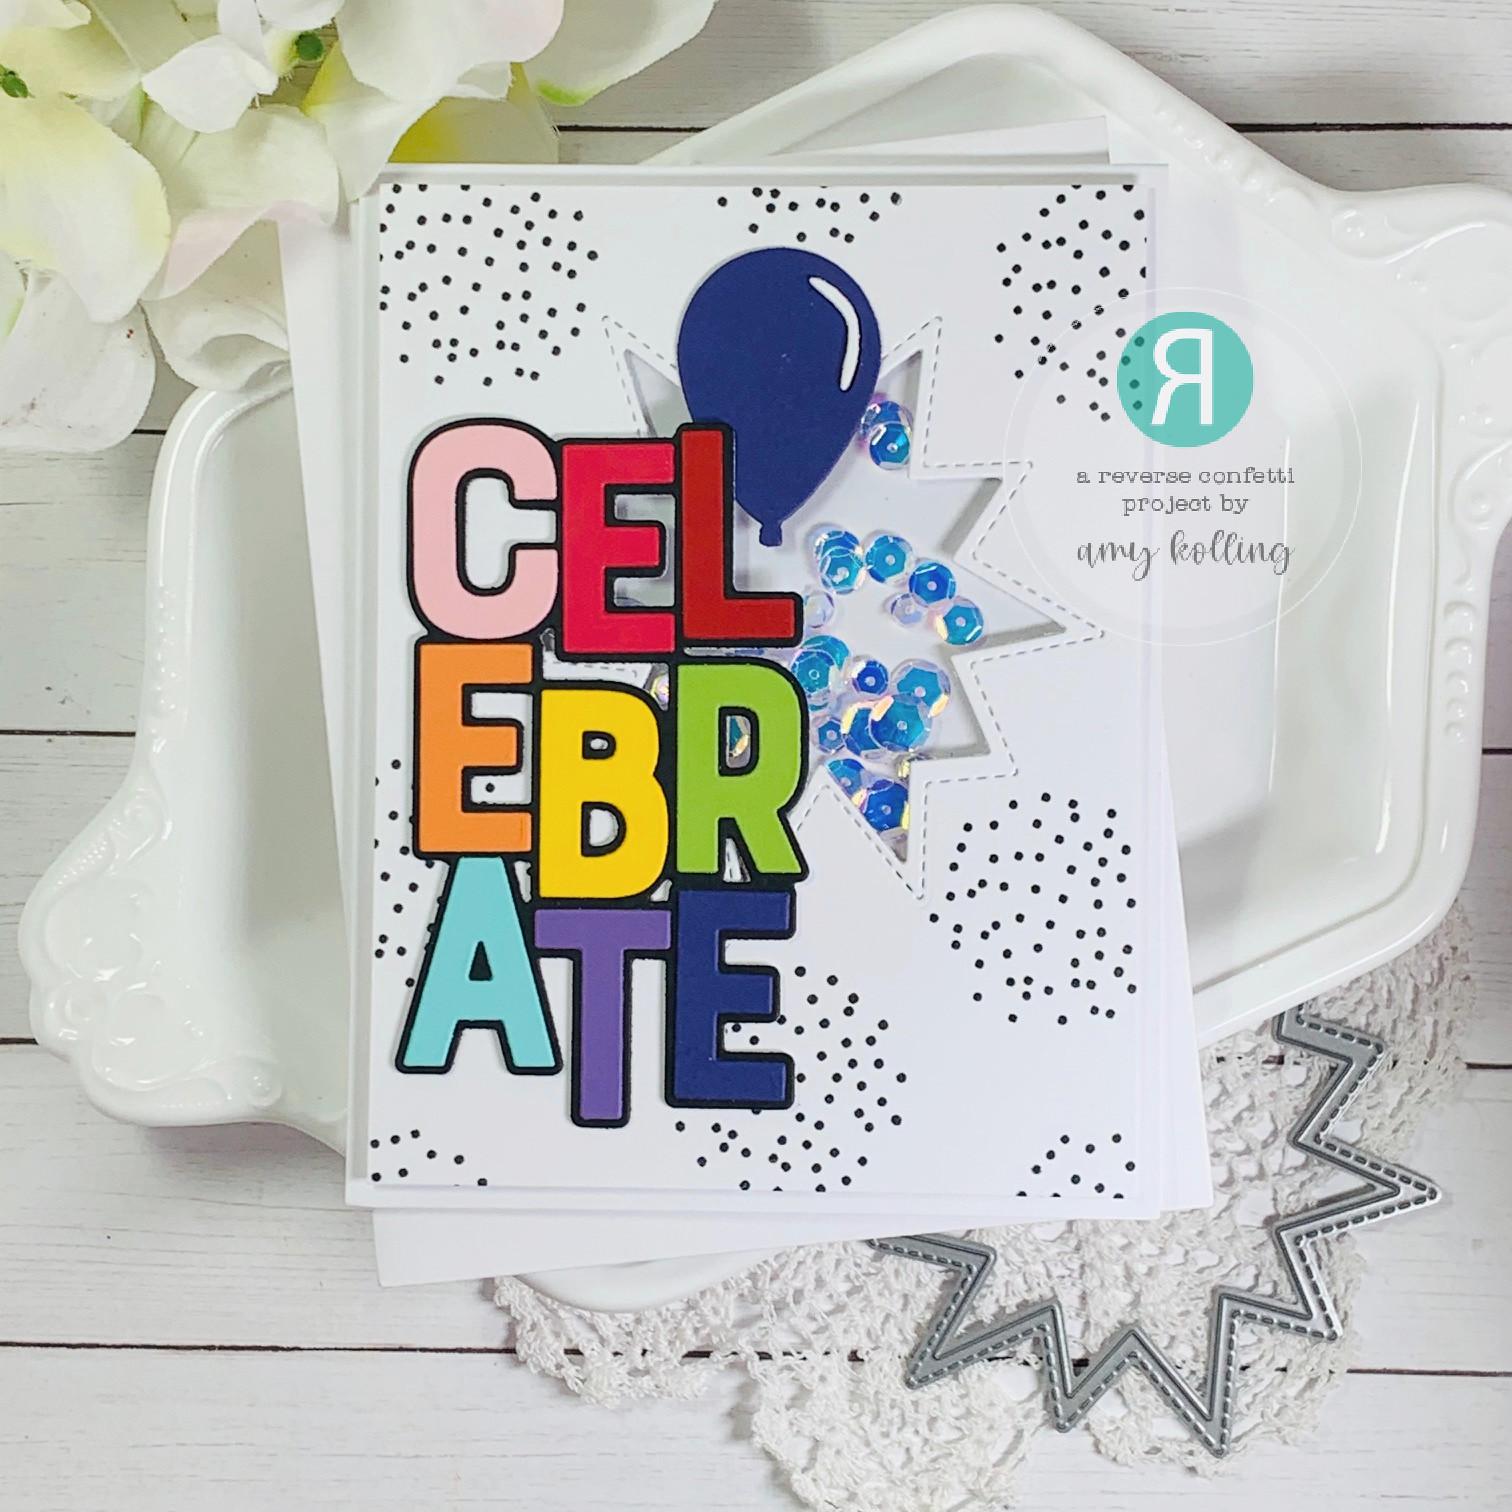 Celebrate (1)